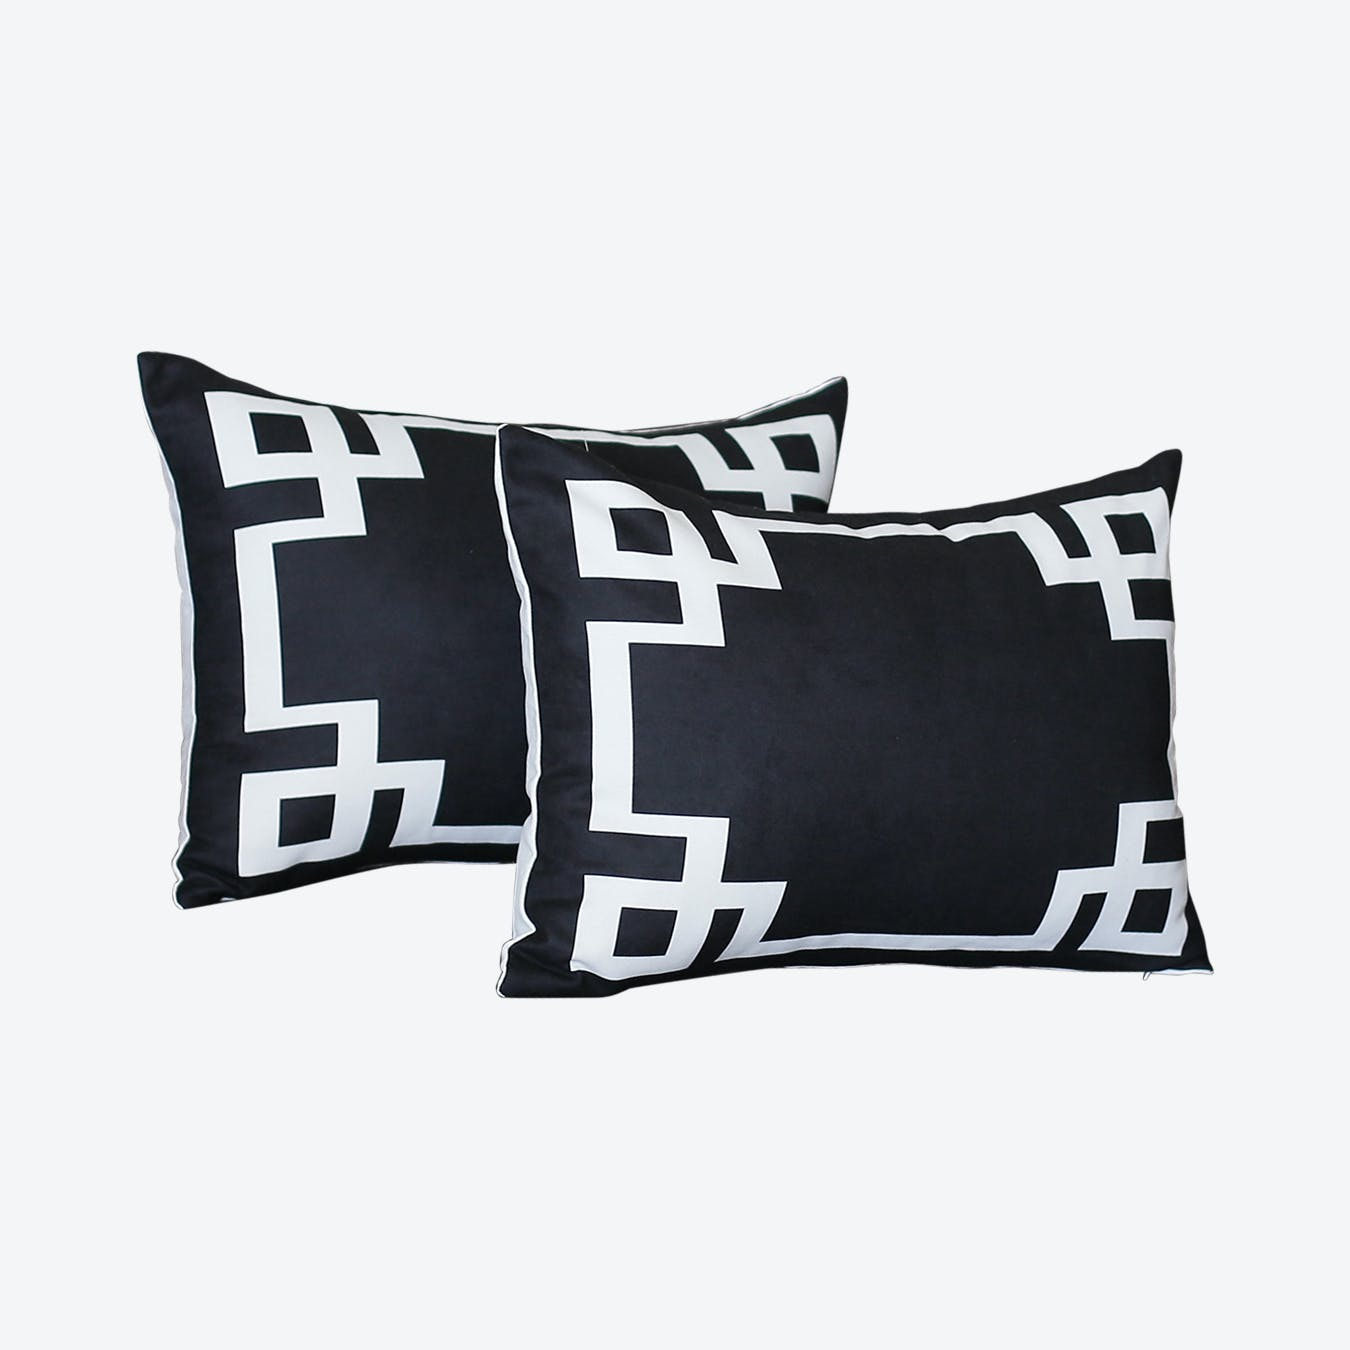 geometric rectangle decorative throw pillow covers black white set of 2